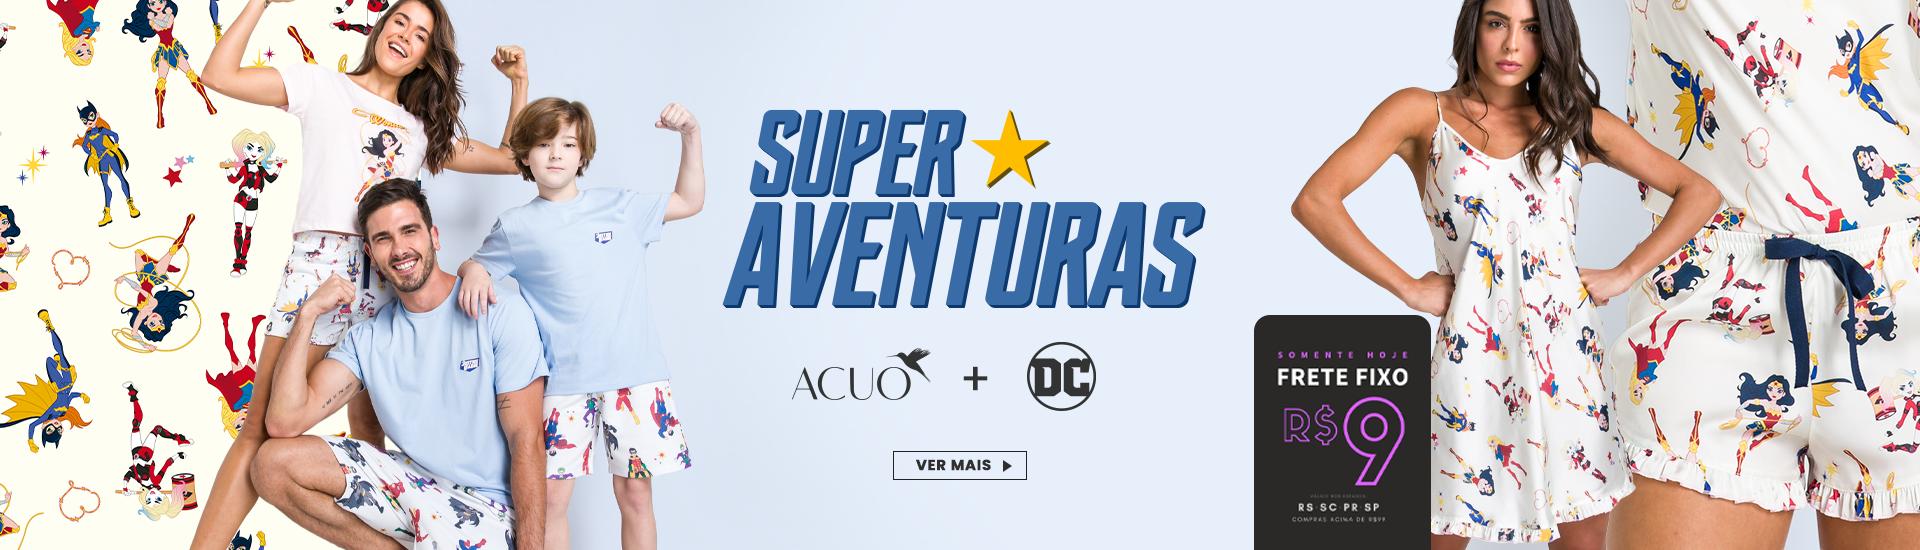 SuperAventuras